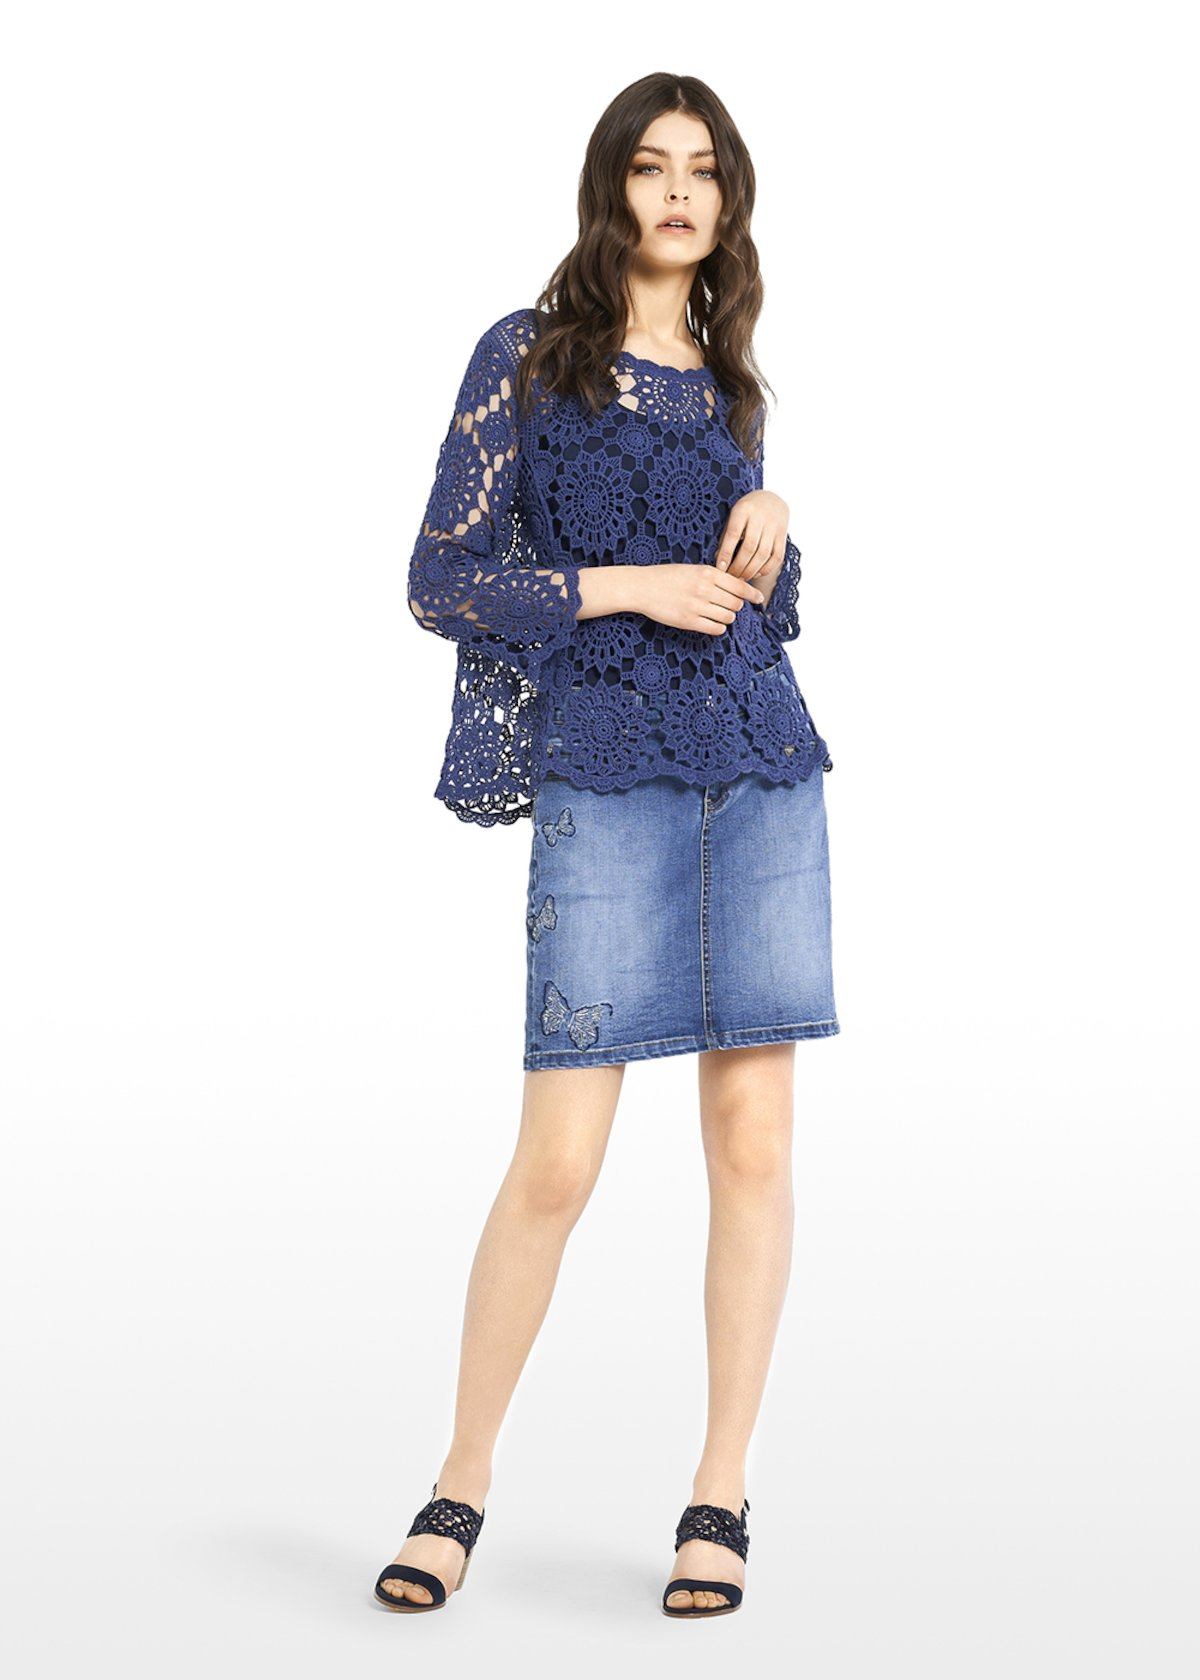 Suny crochet round neck t-shirt - Blue - Woman - Category image